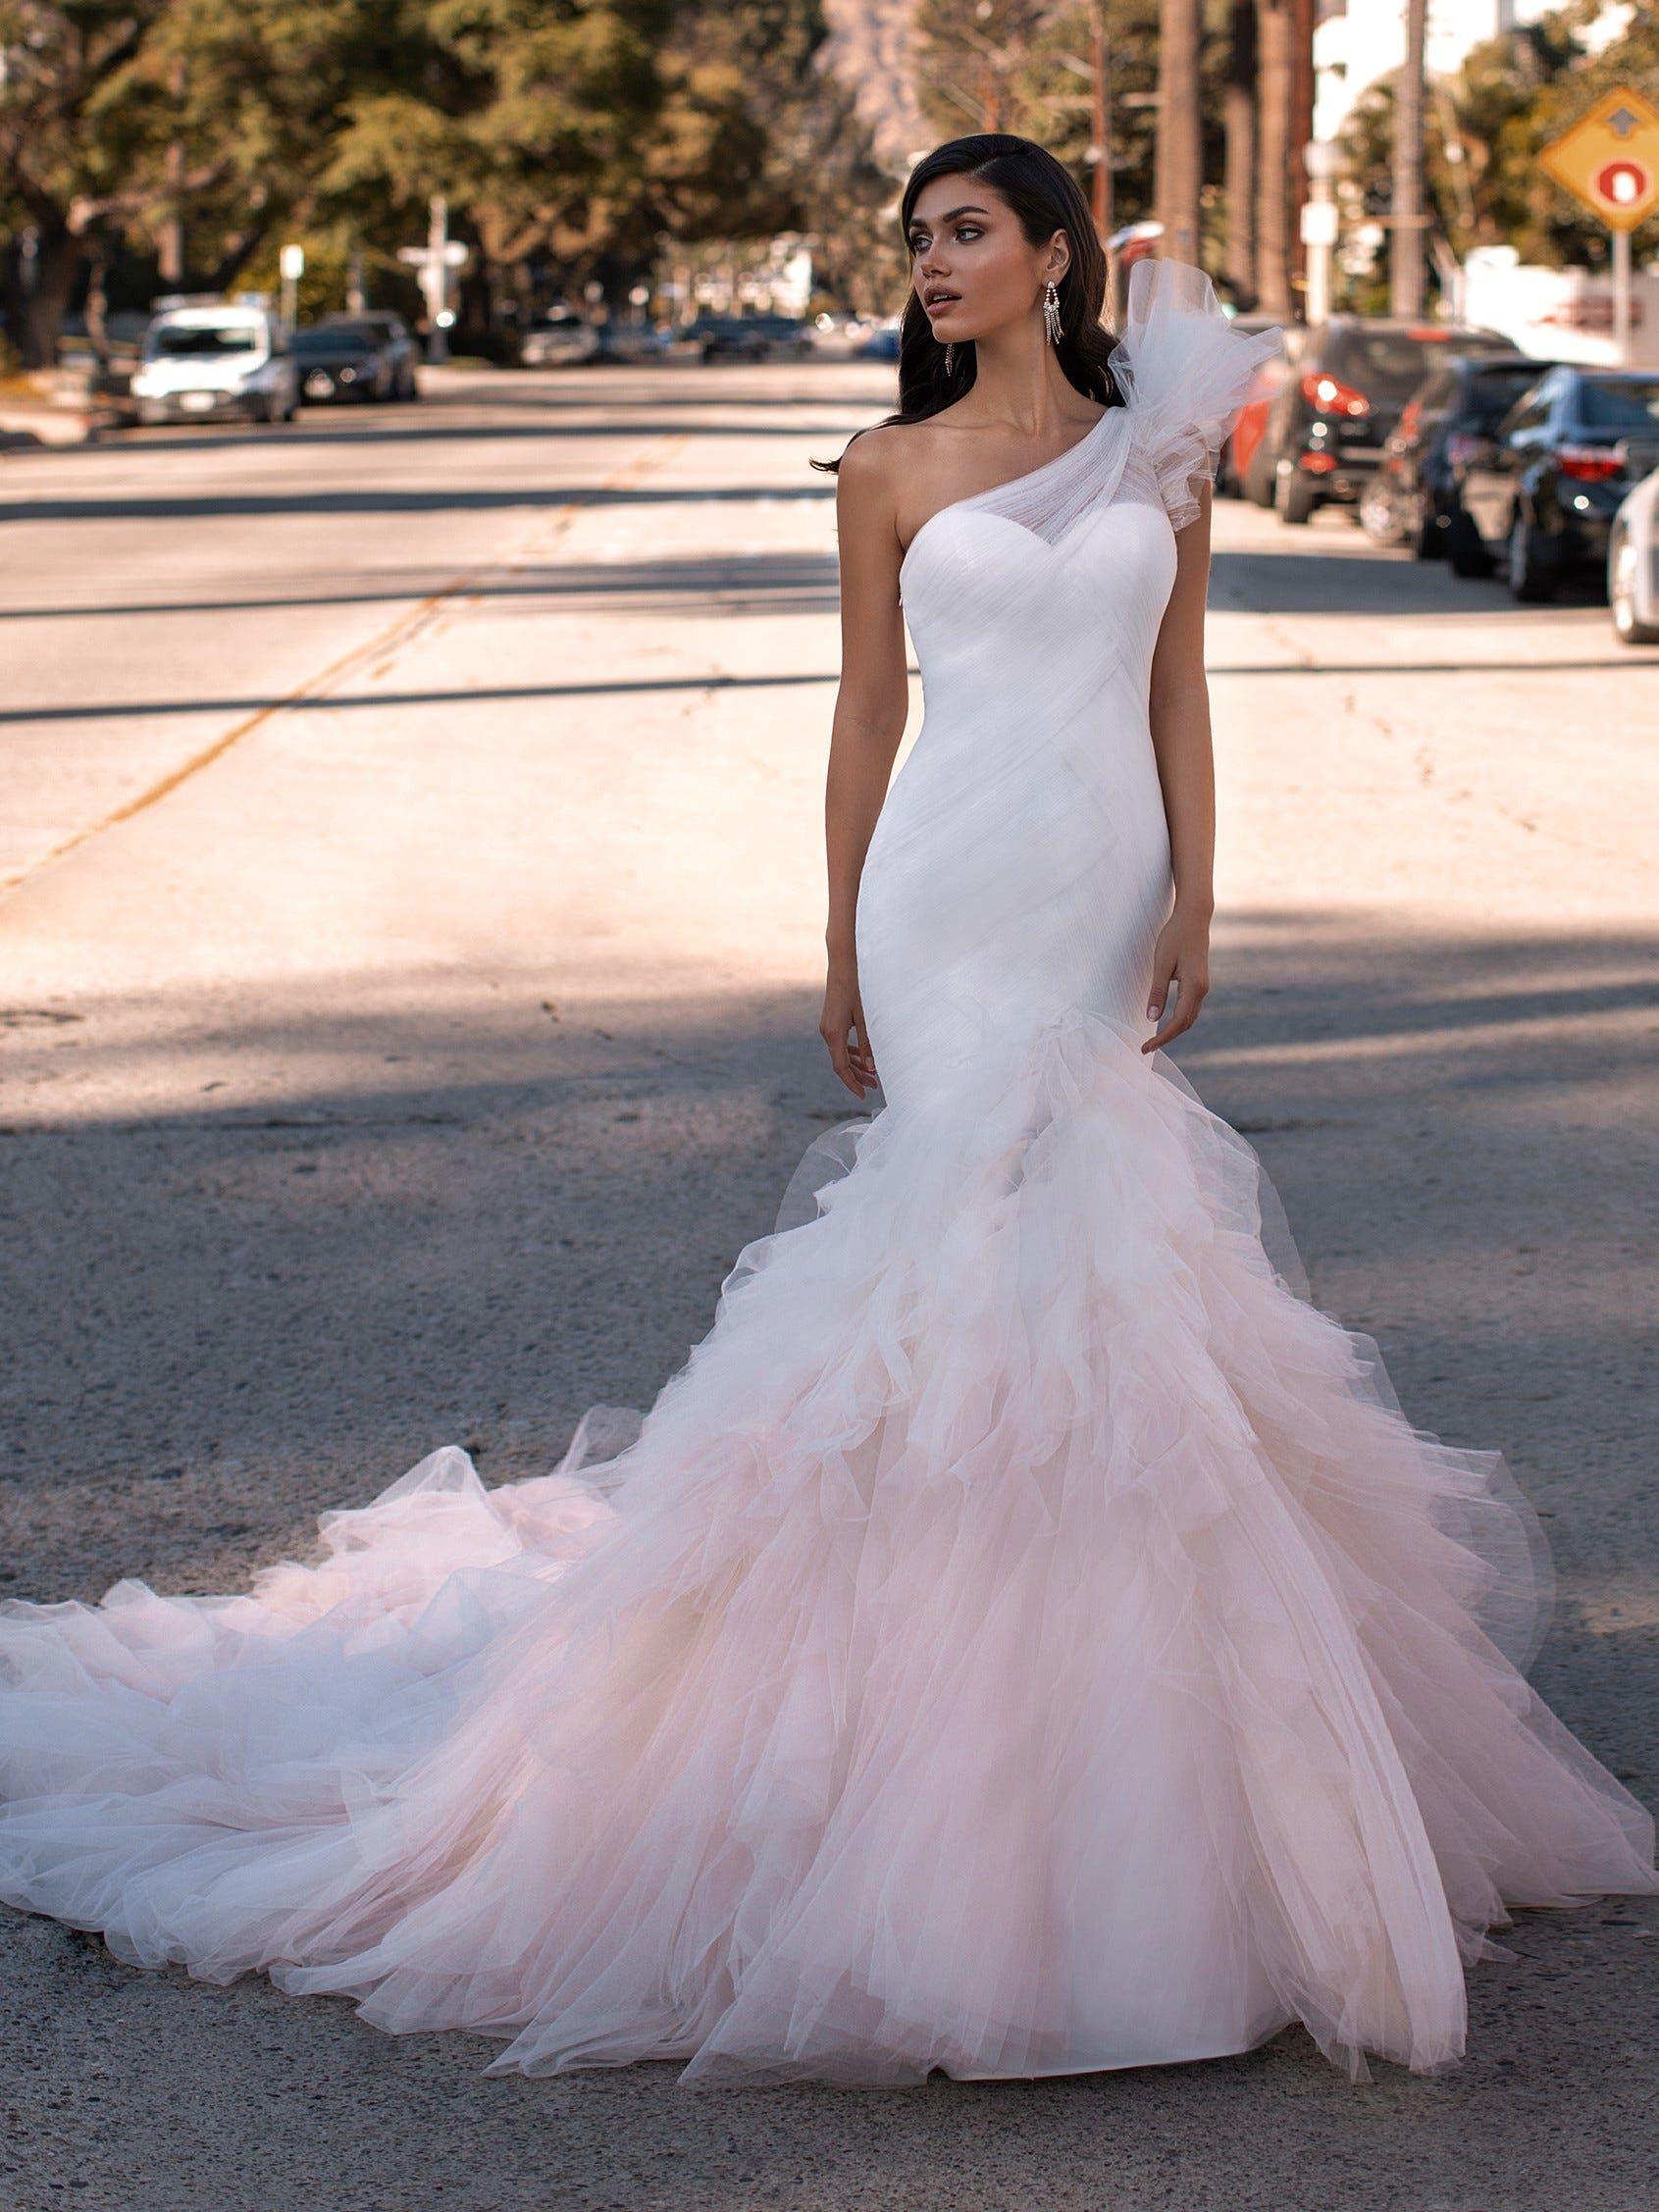 Mermaid Wedding Dress With Asymmetric Neckline In 2020 Ruffle Wedding Dress Pronovias Wedding Dress Wedding Dress Long Sleeve [ 2255 x 1691 Pixel ]